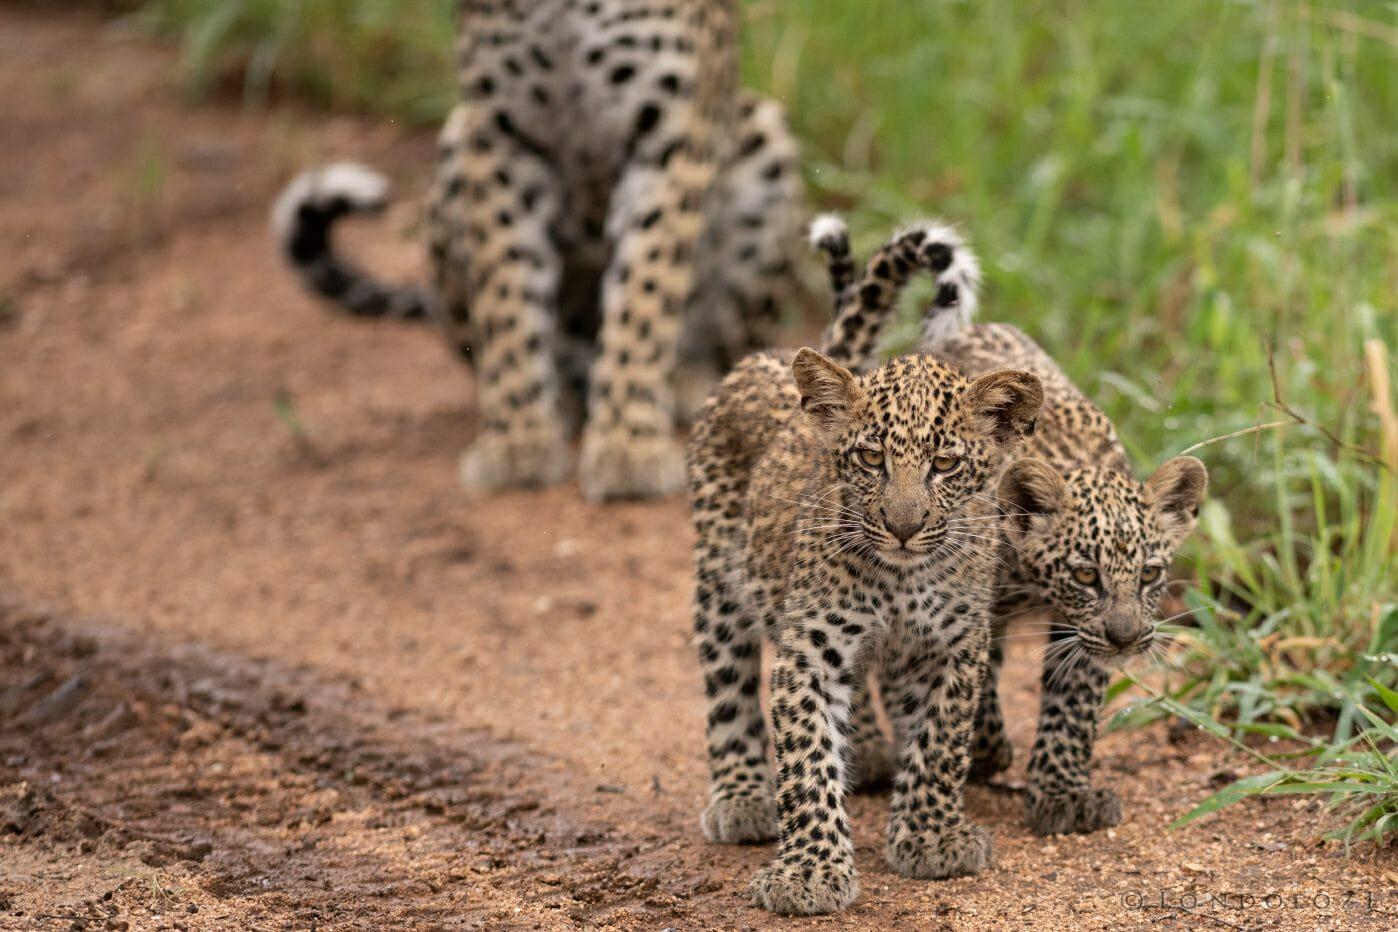 Ximungwe Cubs